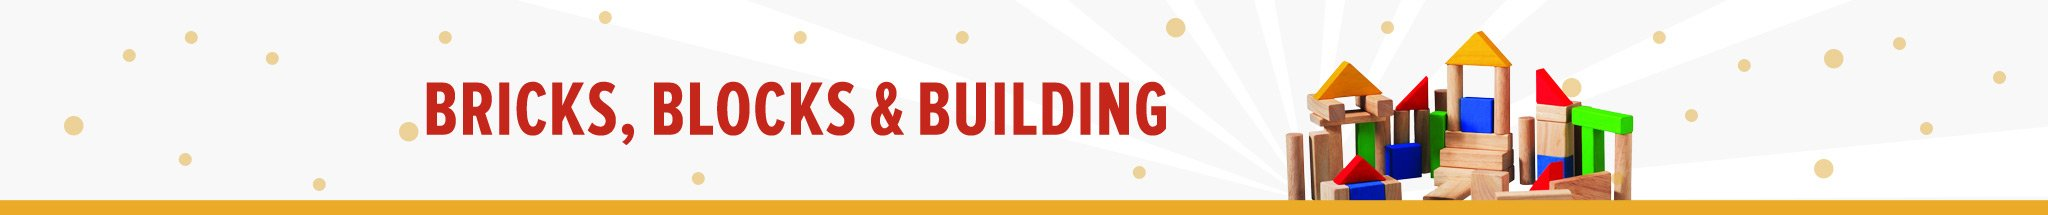 Bricks, Blocks & Building